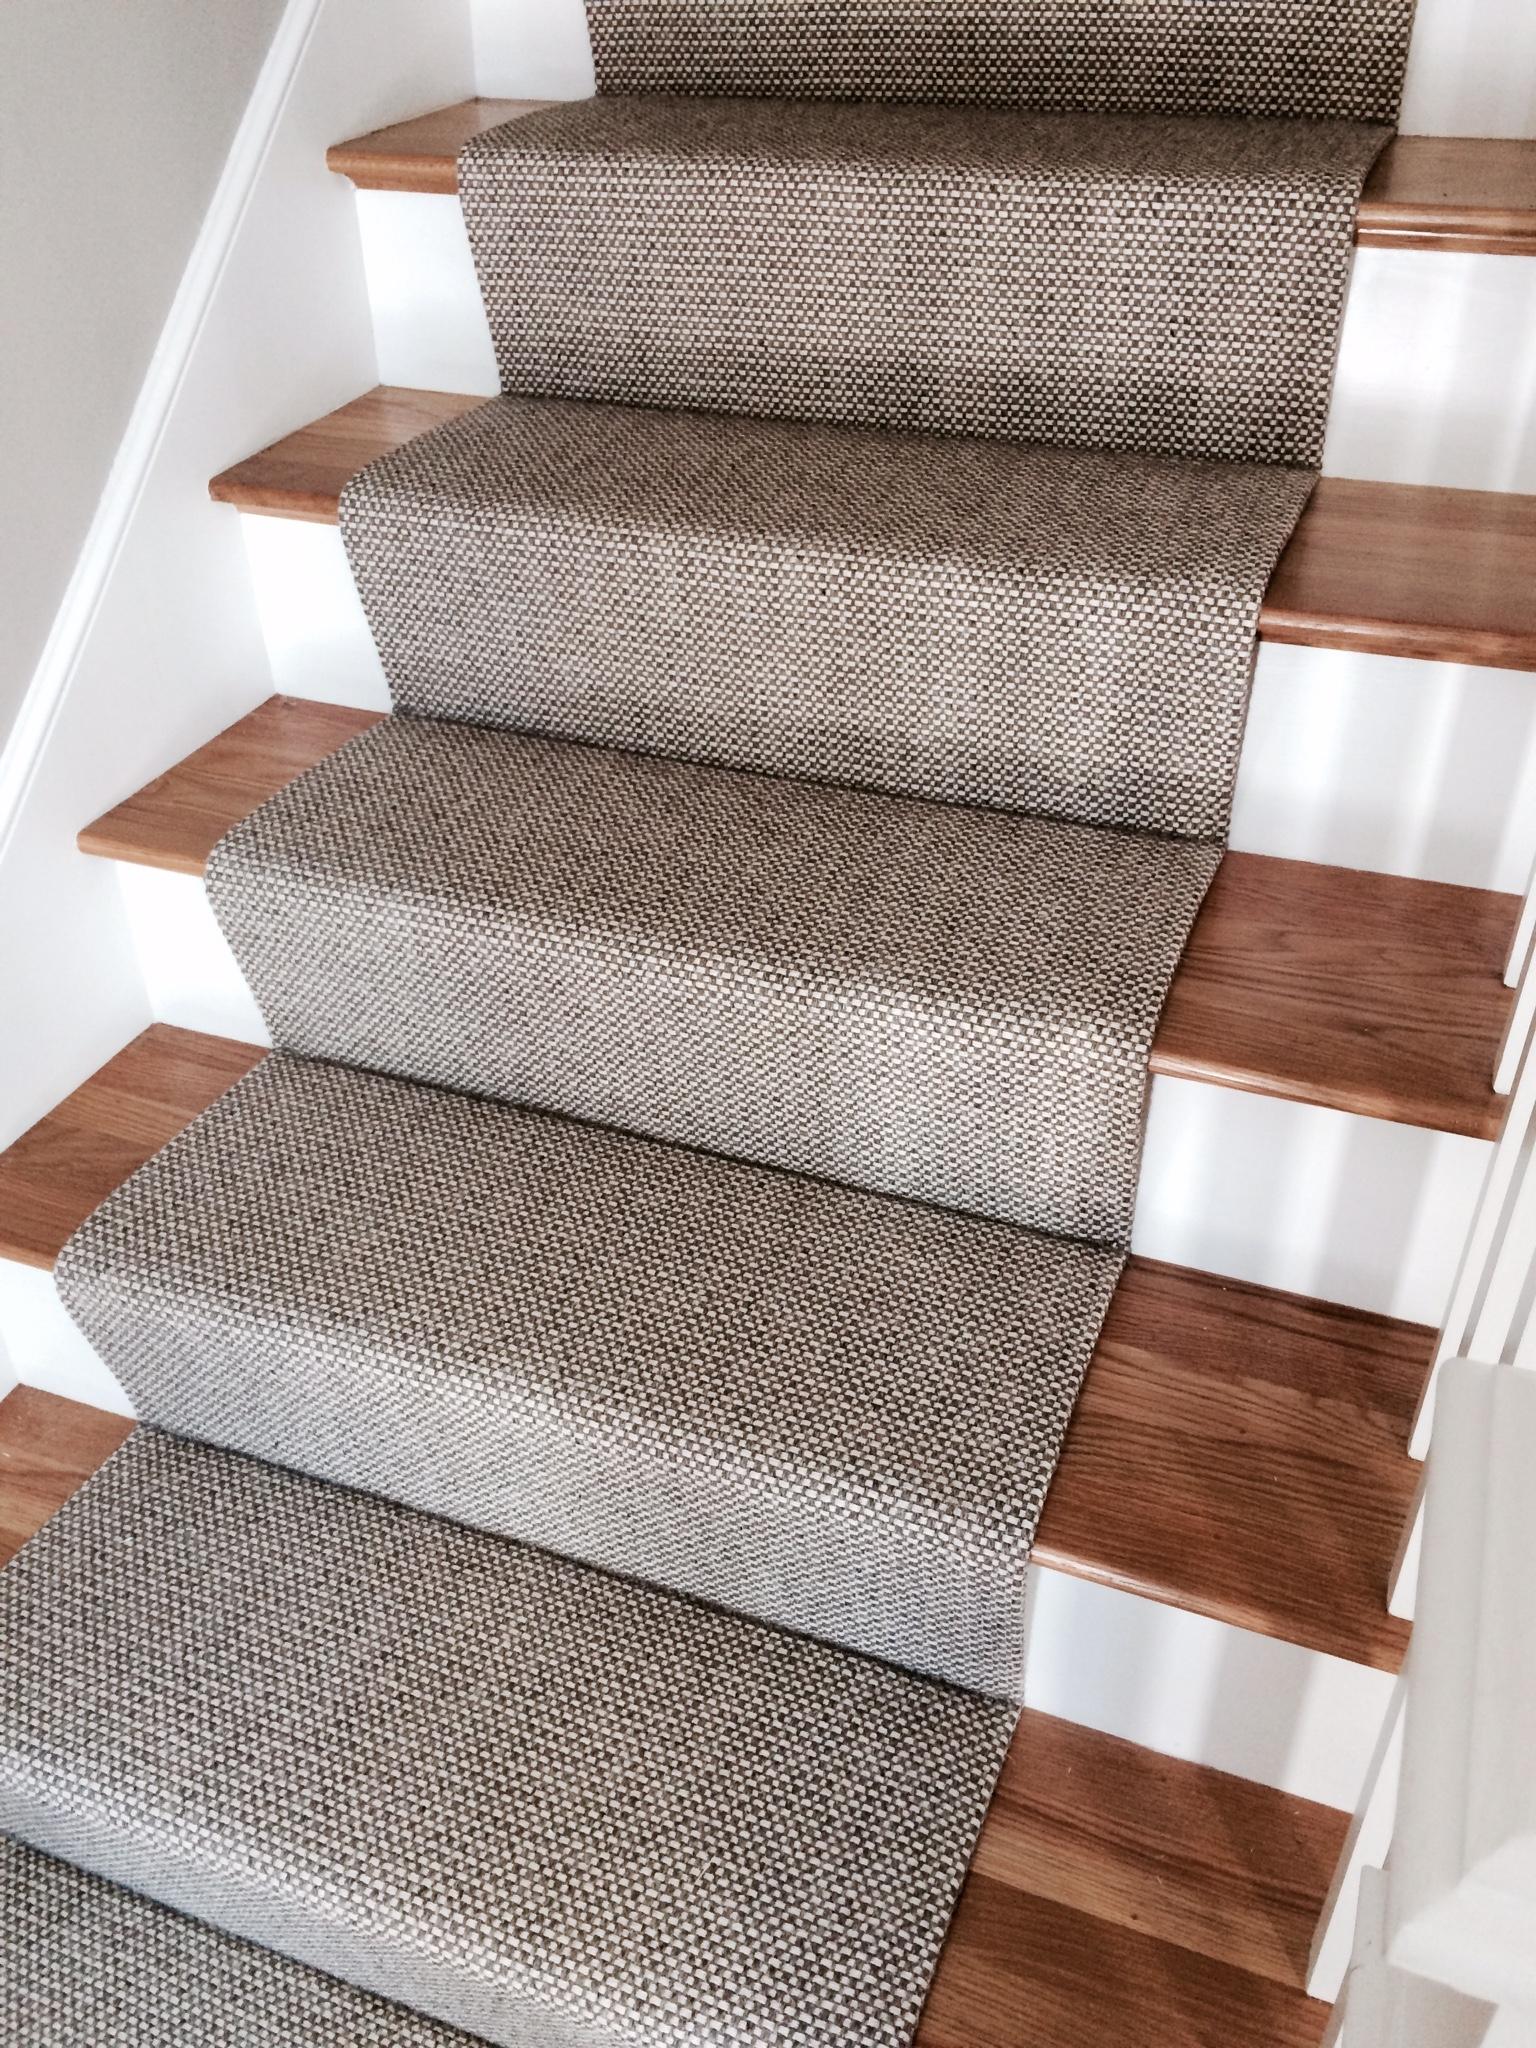 Carpet Runner For Stairs In Custom Stair Tread Rugs (#4 of 20)